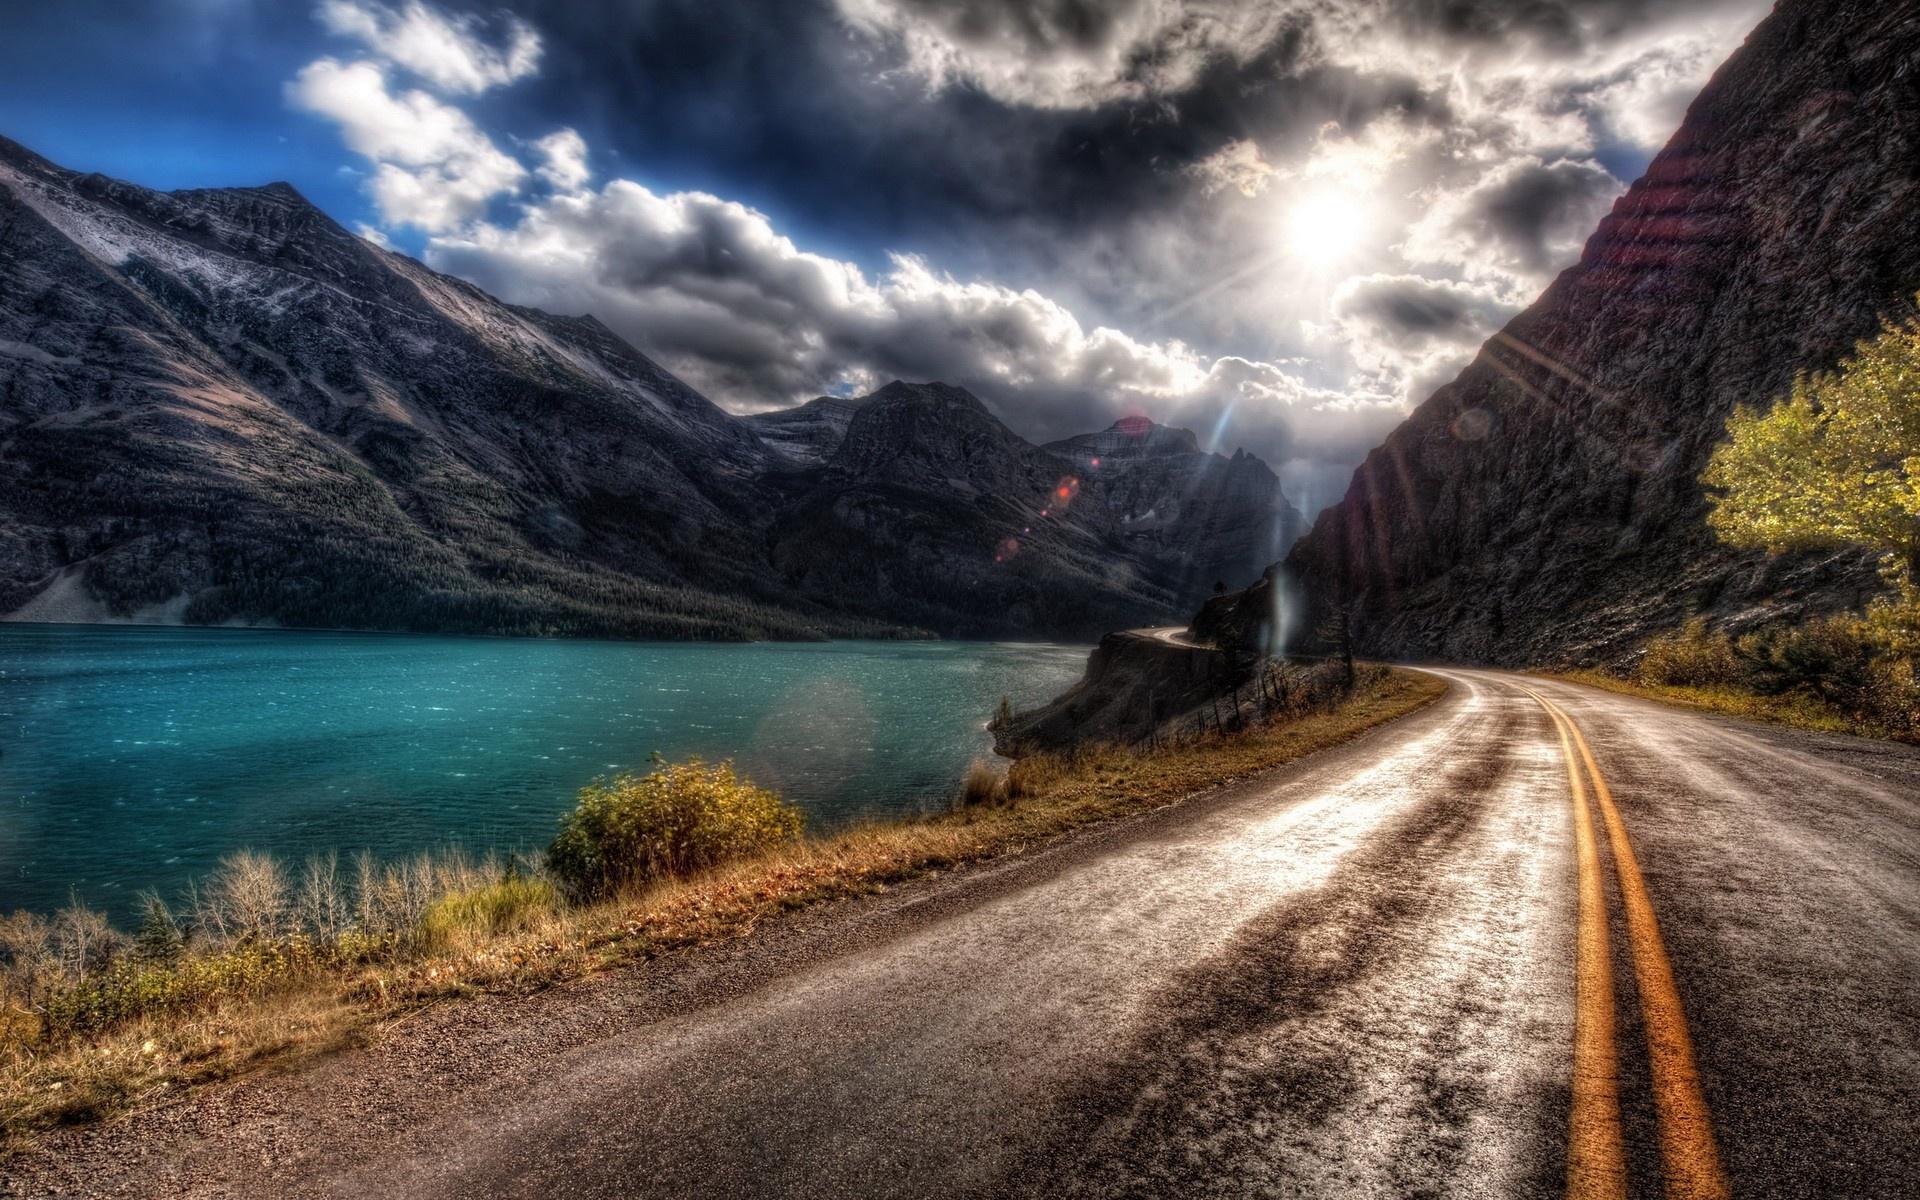 Amazing Mountain Road Wallpaper